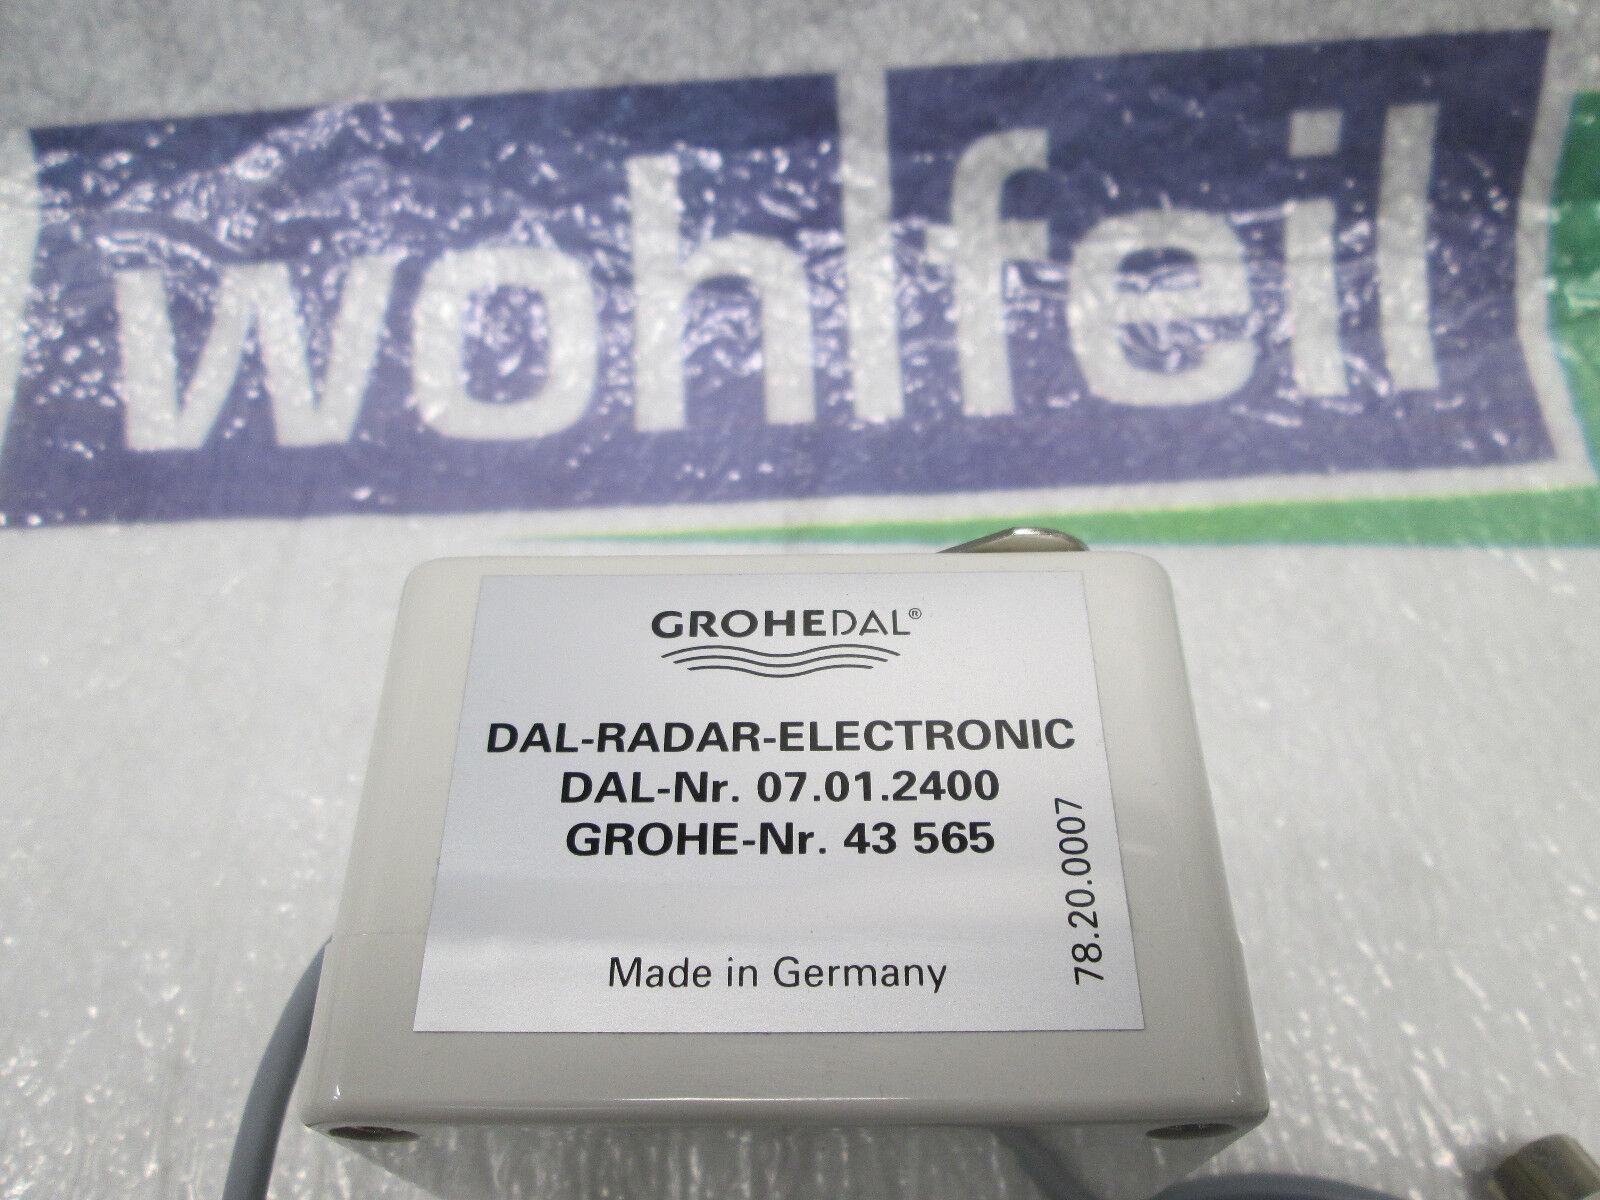 GROHE Radarmelder; Art-Nr.: 43 565 000